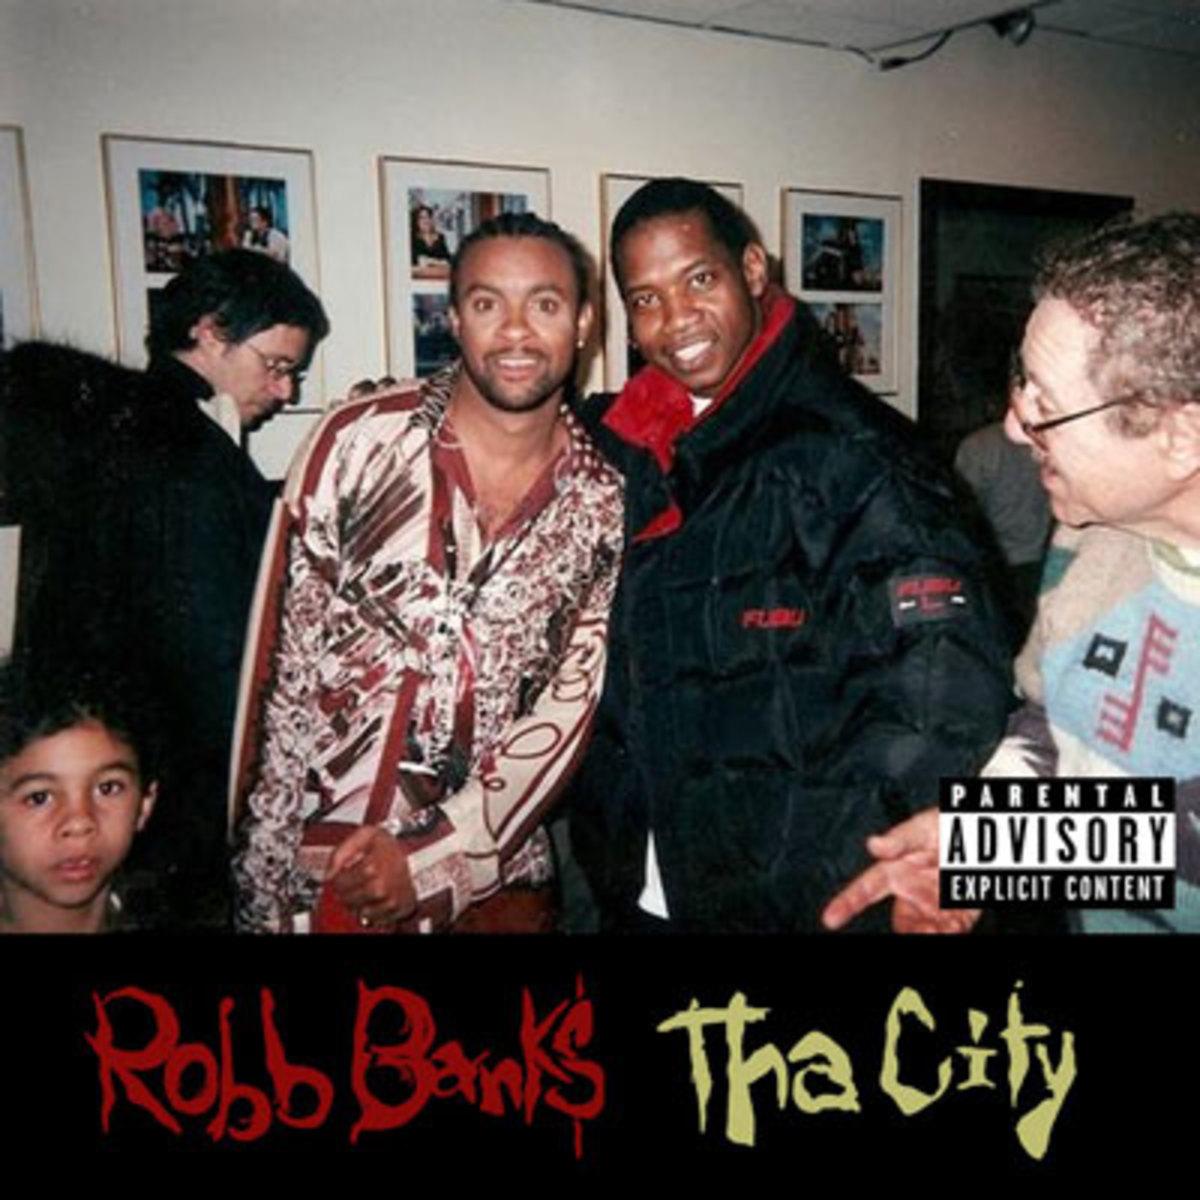 robbbanks-thacity2.jpg